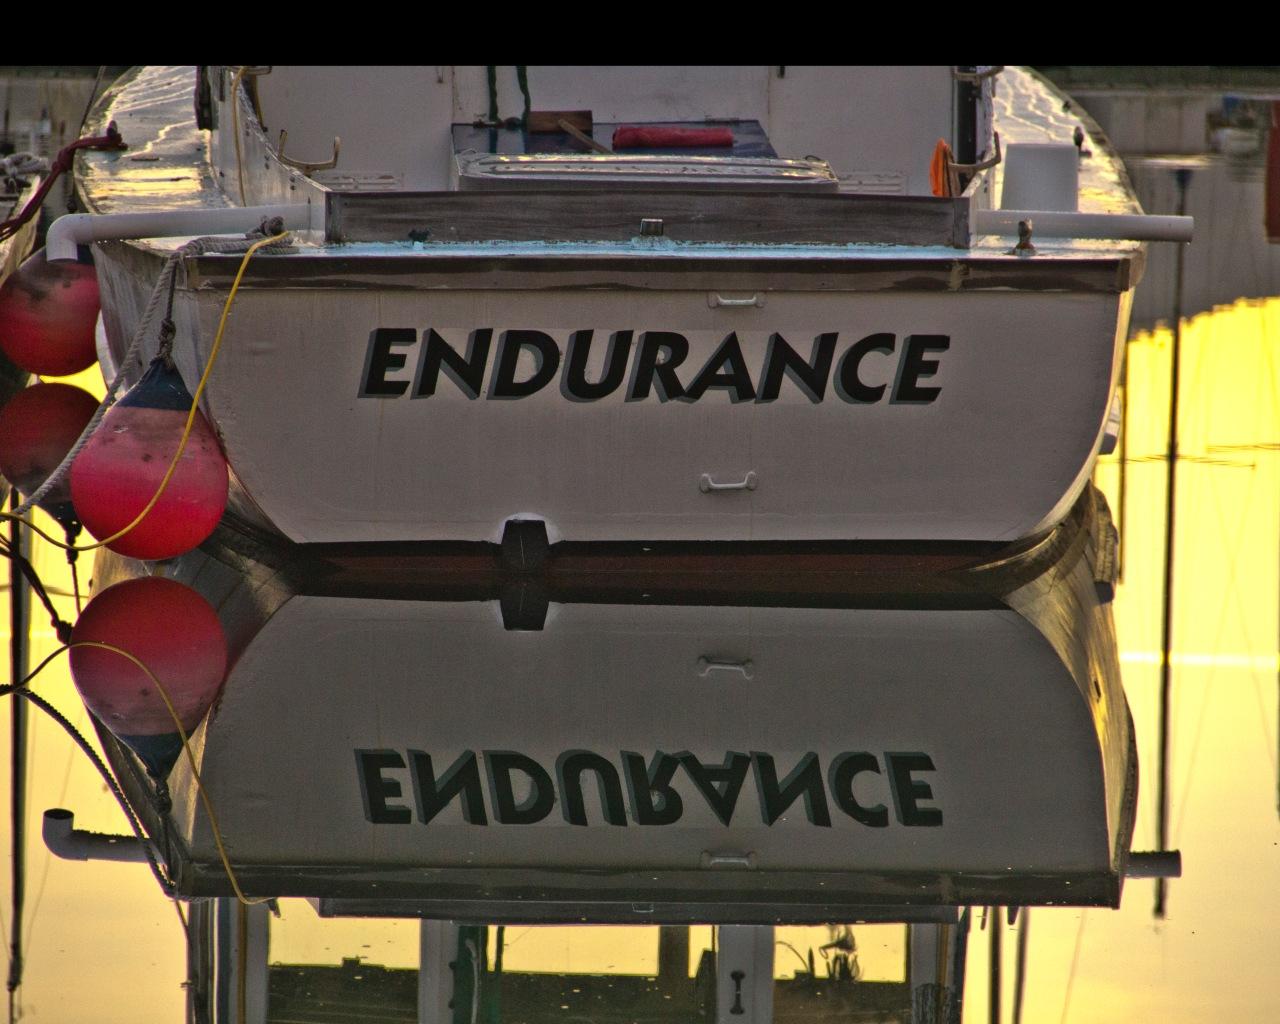 Endurance march 2018